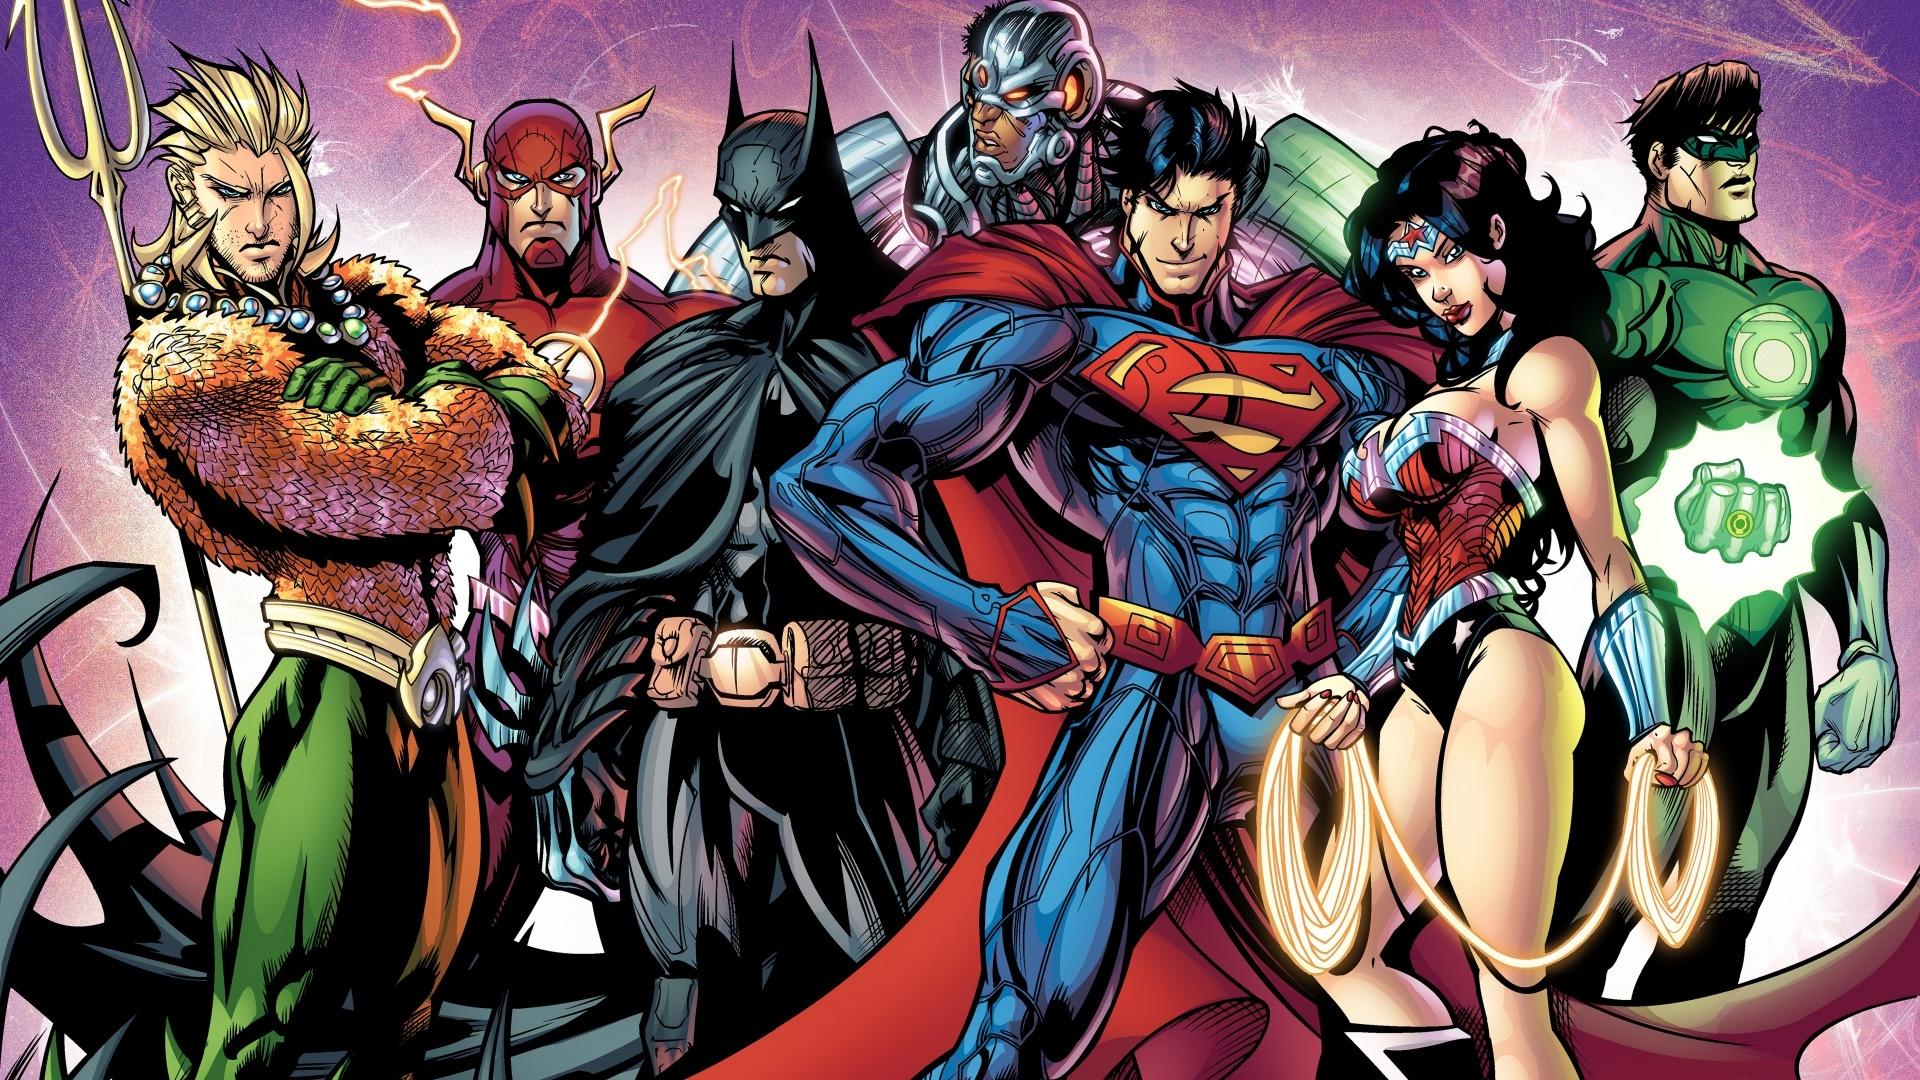 Justice League desktop wallpaper free download